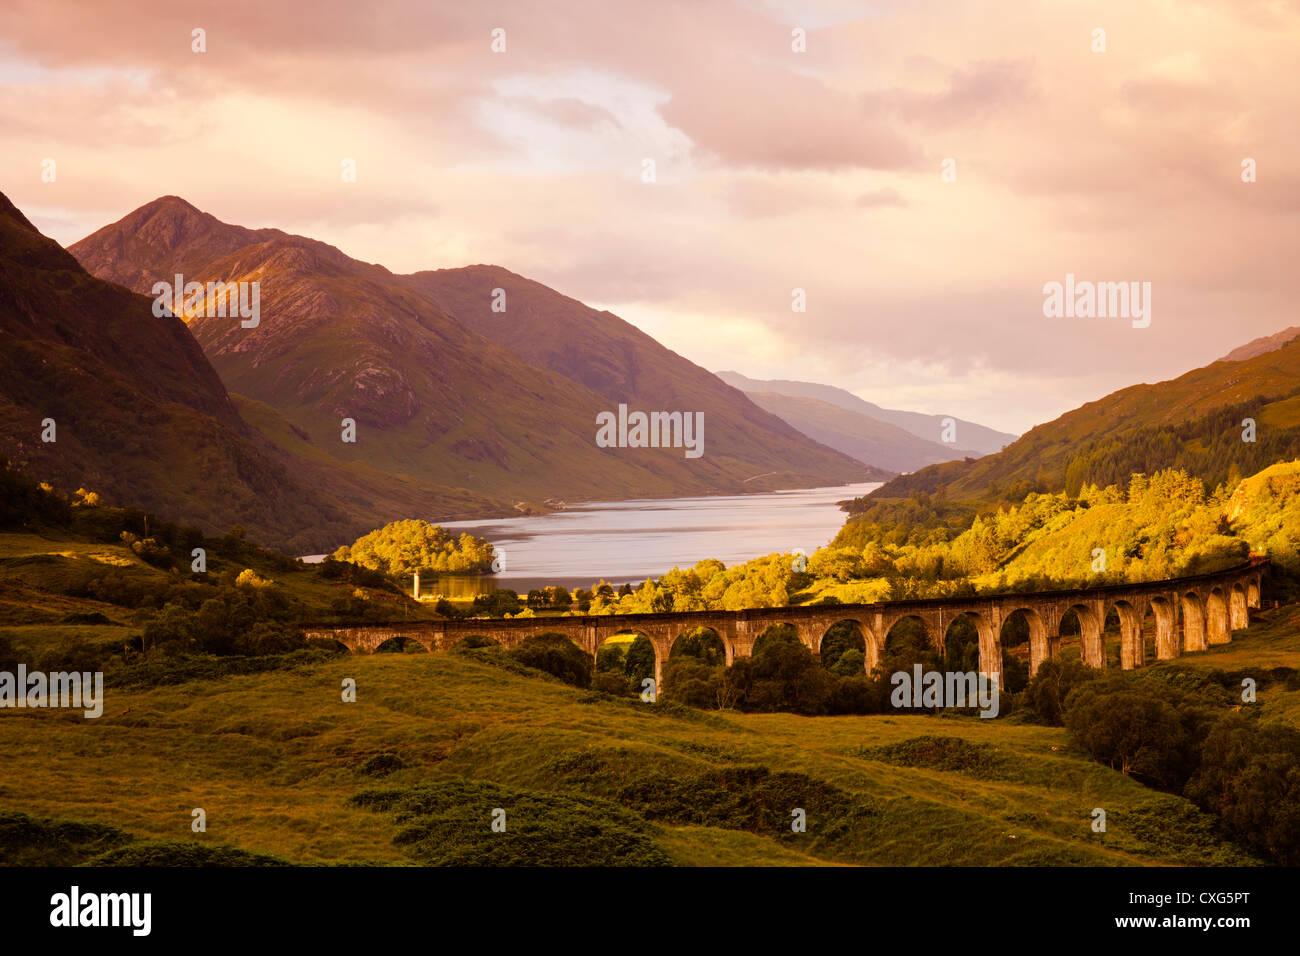 Glenfinnan Viaduct at sunrise with Loch Shiel, Lochaber, Scotland, UK, Europe - Stock Image